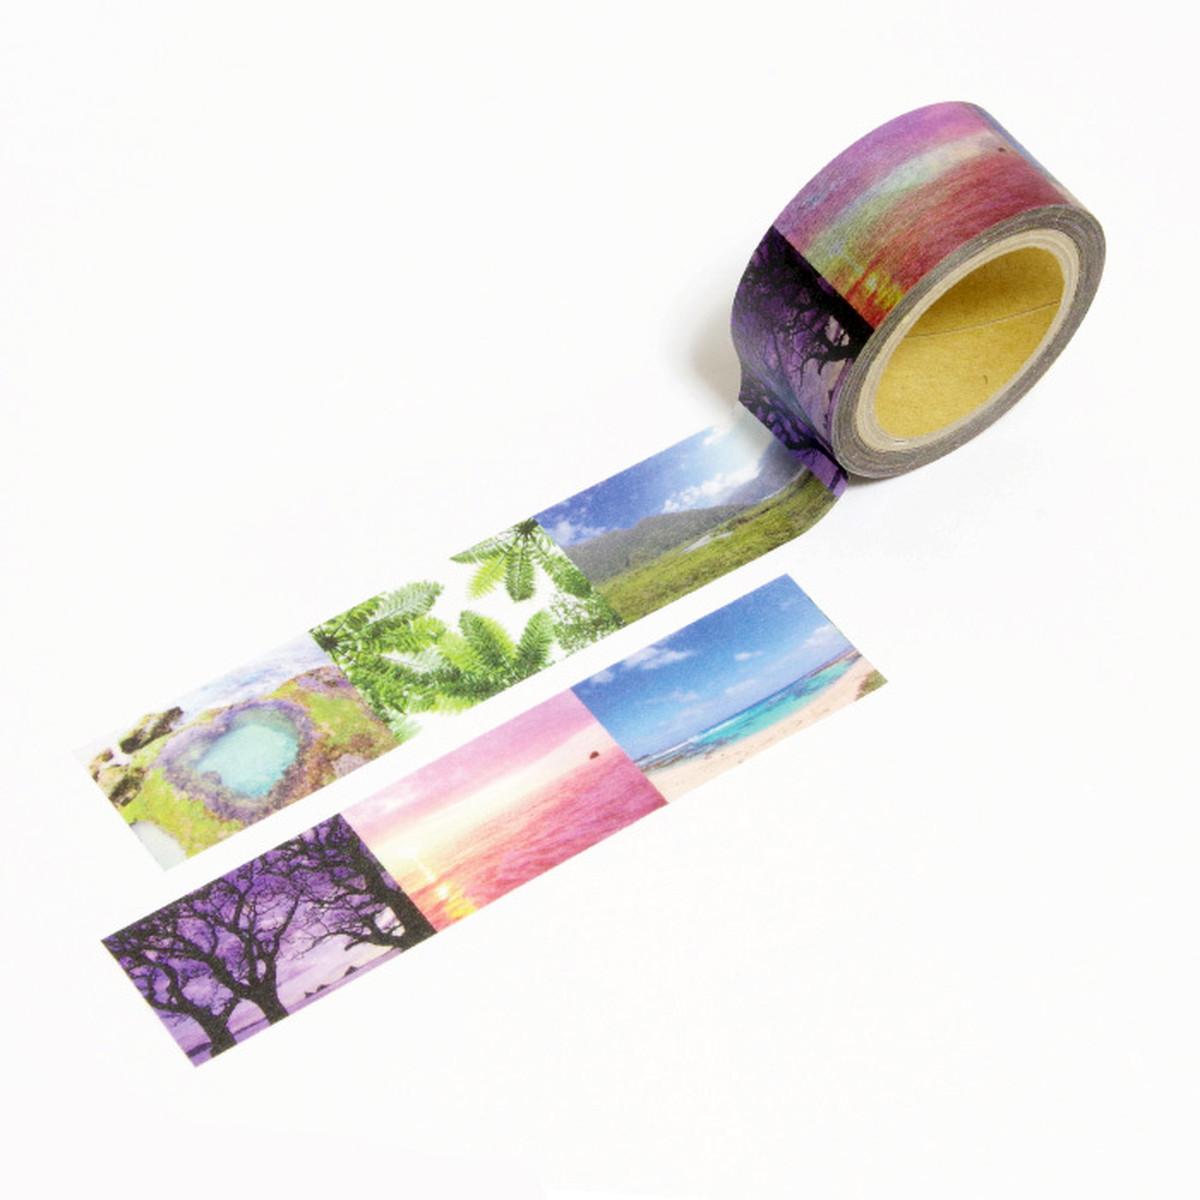 Amami Photograph Vol.1 マスキングテープ feat.Masaru Makito   abcom design products.ーアビコムデザ...